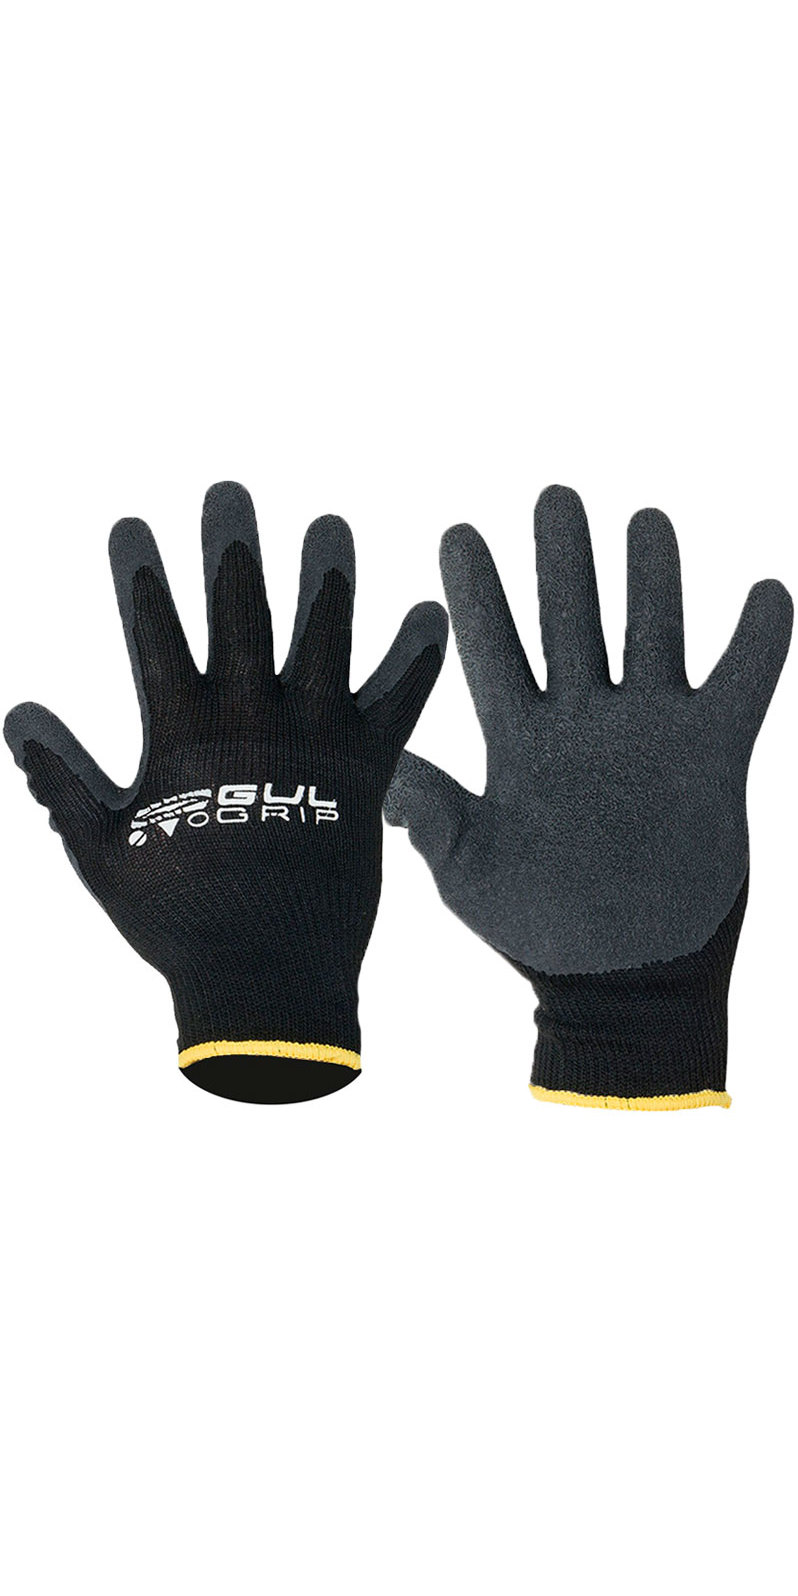 2019 Gul Evogrip Latex Palm Handschuhe Gl1295-a9